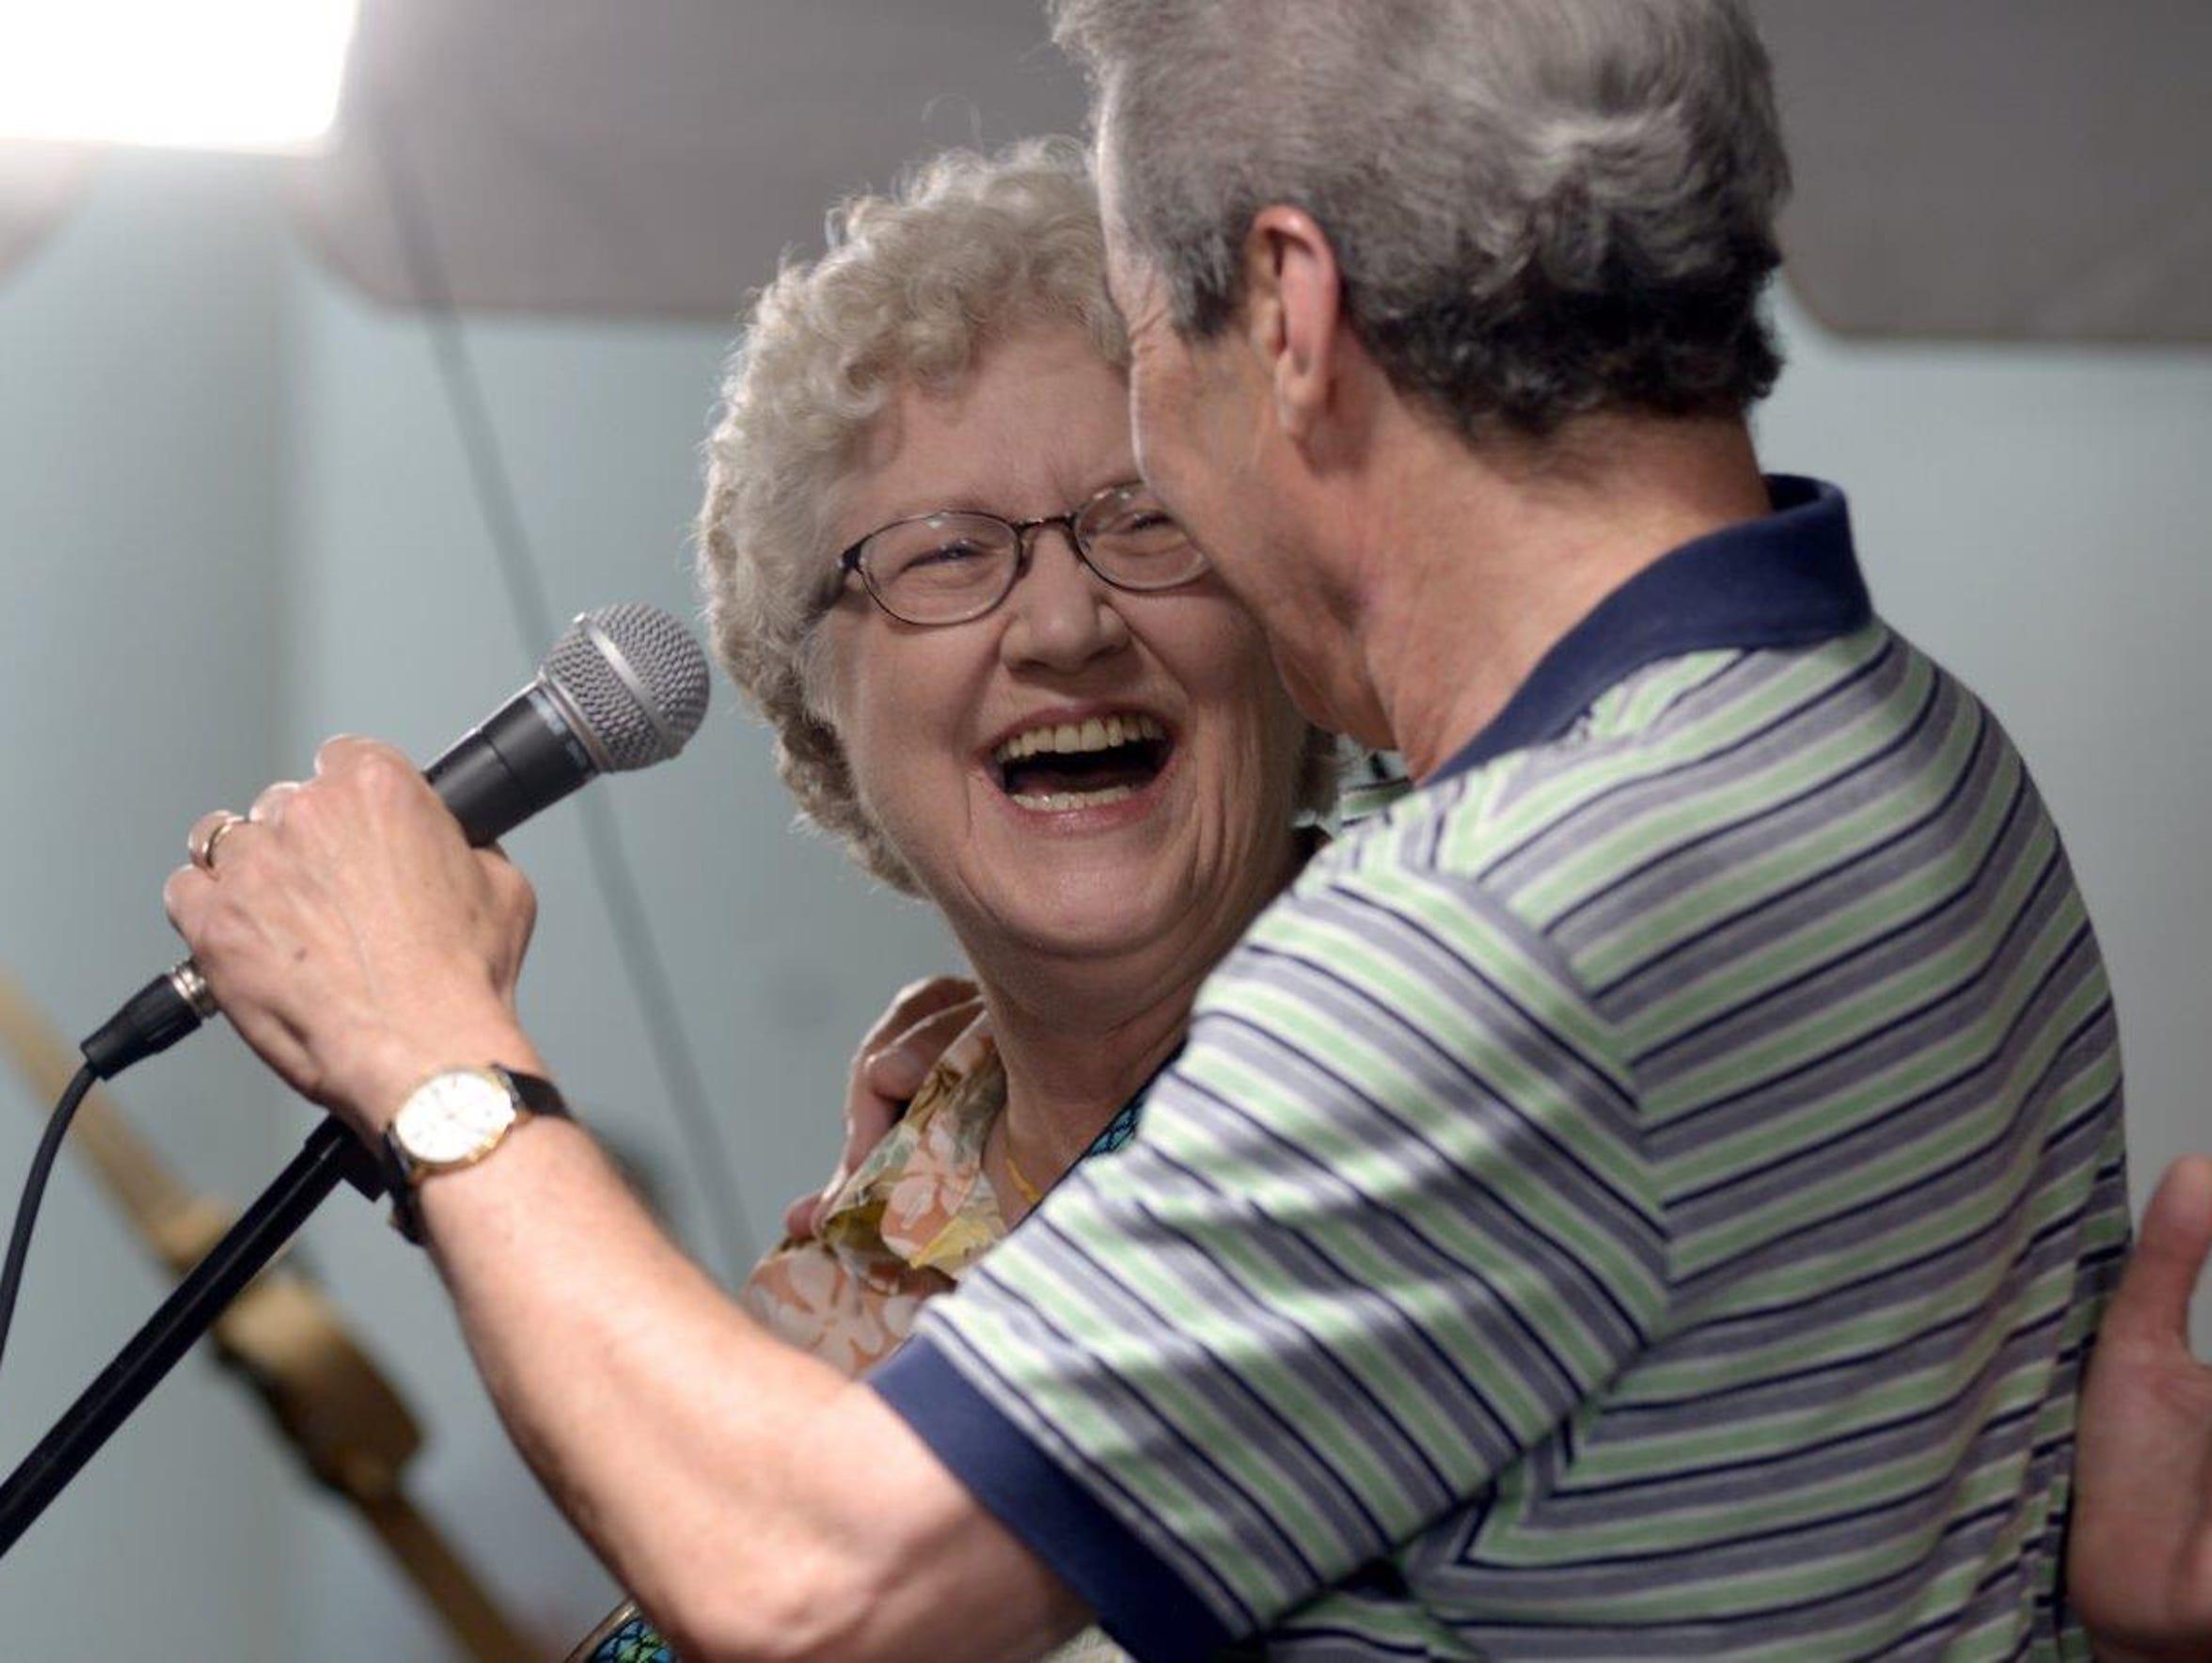 Staunton Mayor Carolyn Dull and Daniel Heifetz, founder